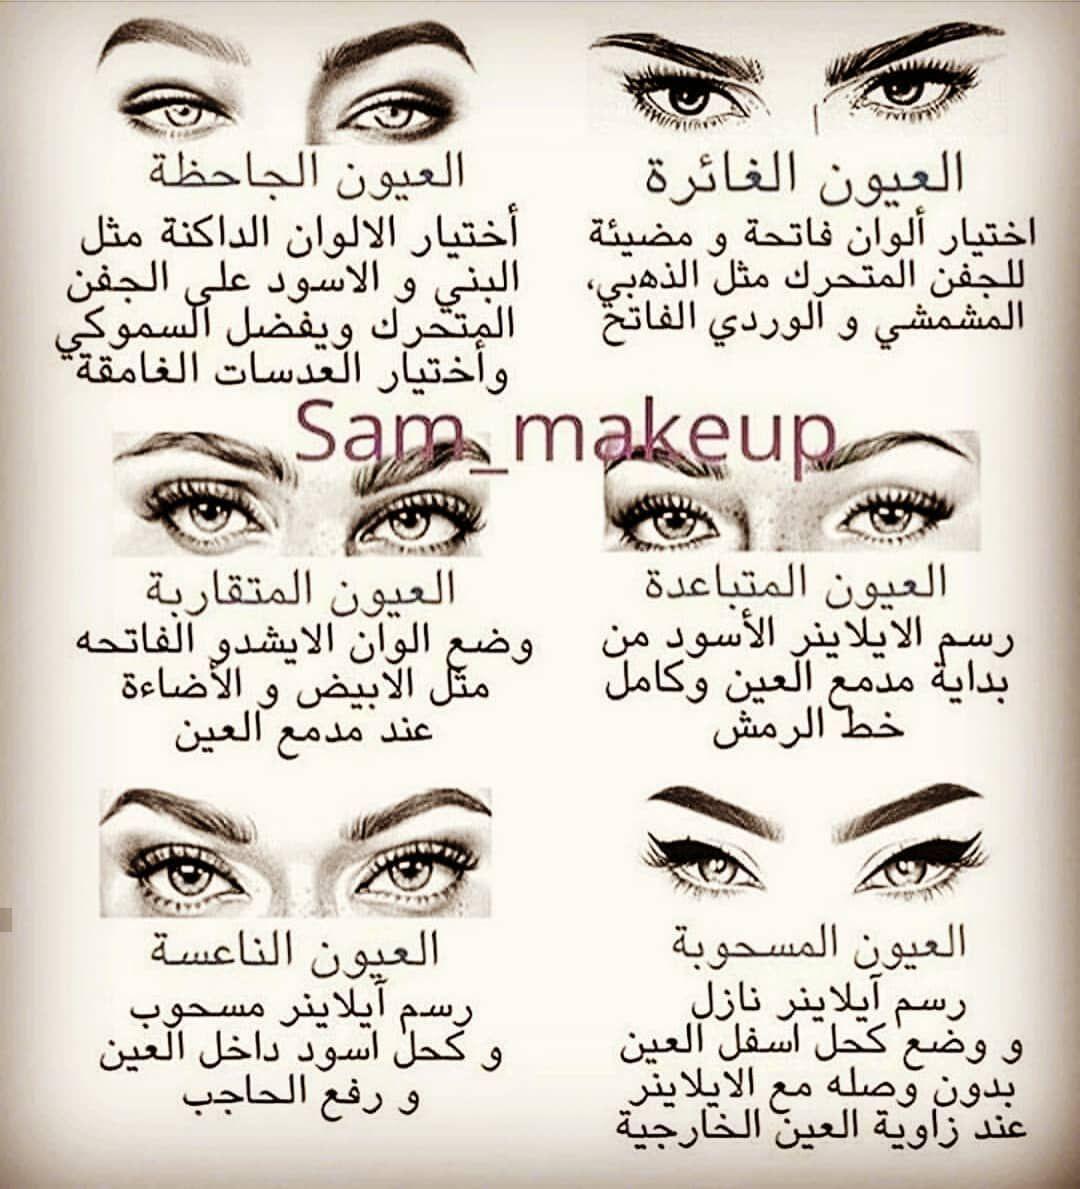 Nbsp Nbsp Makeuptutorial Nbsp Nbsp Nbsp Nbsp Makeup Nbsp Nbsp Nbsp Nbsp Hudabeautynudepalette Nbsp Nbsp N Pinterest Makeup Makeup Spray Makeup